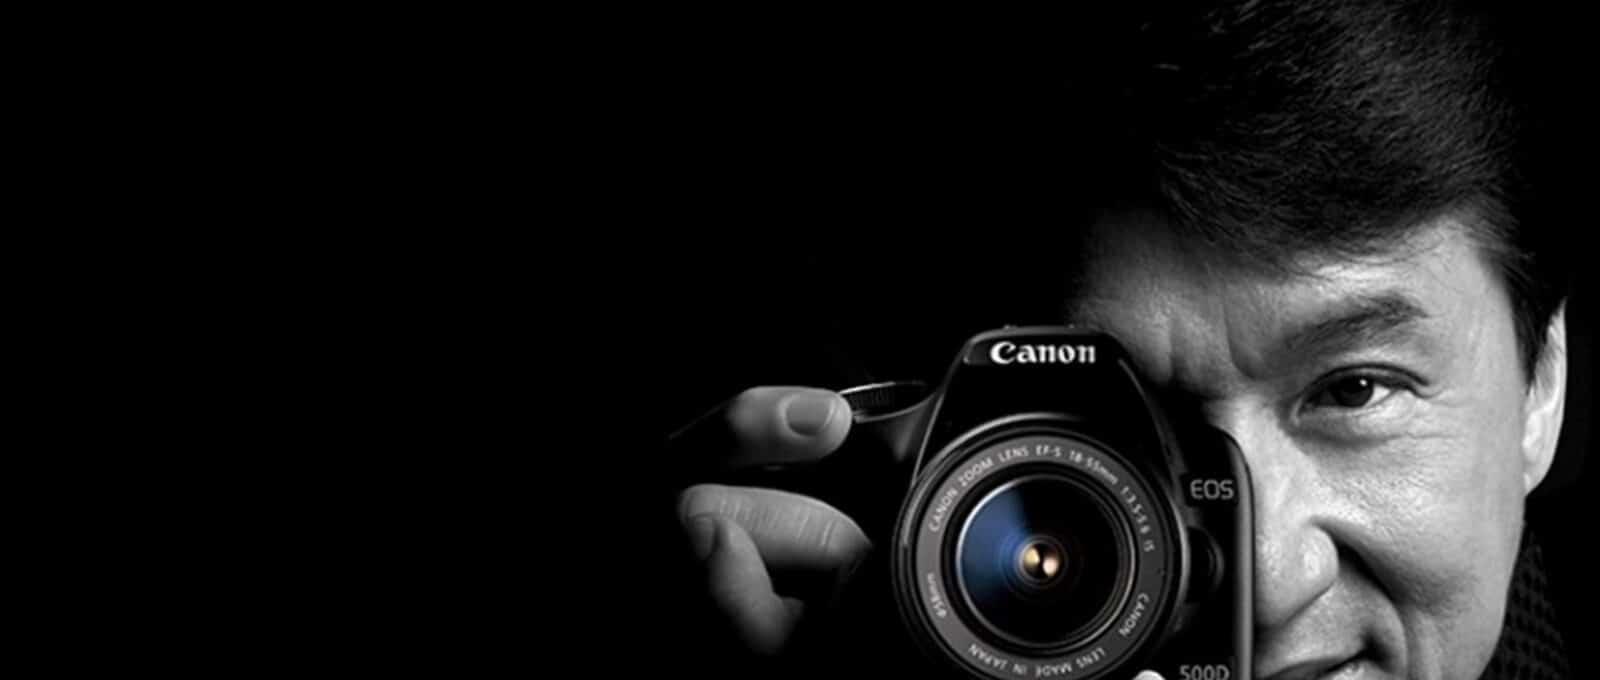 low light camera